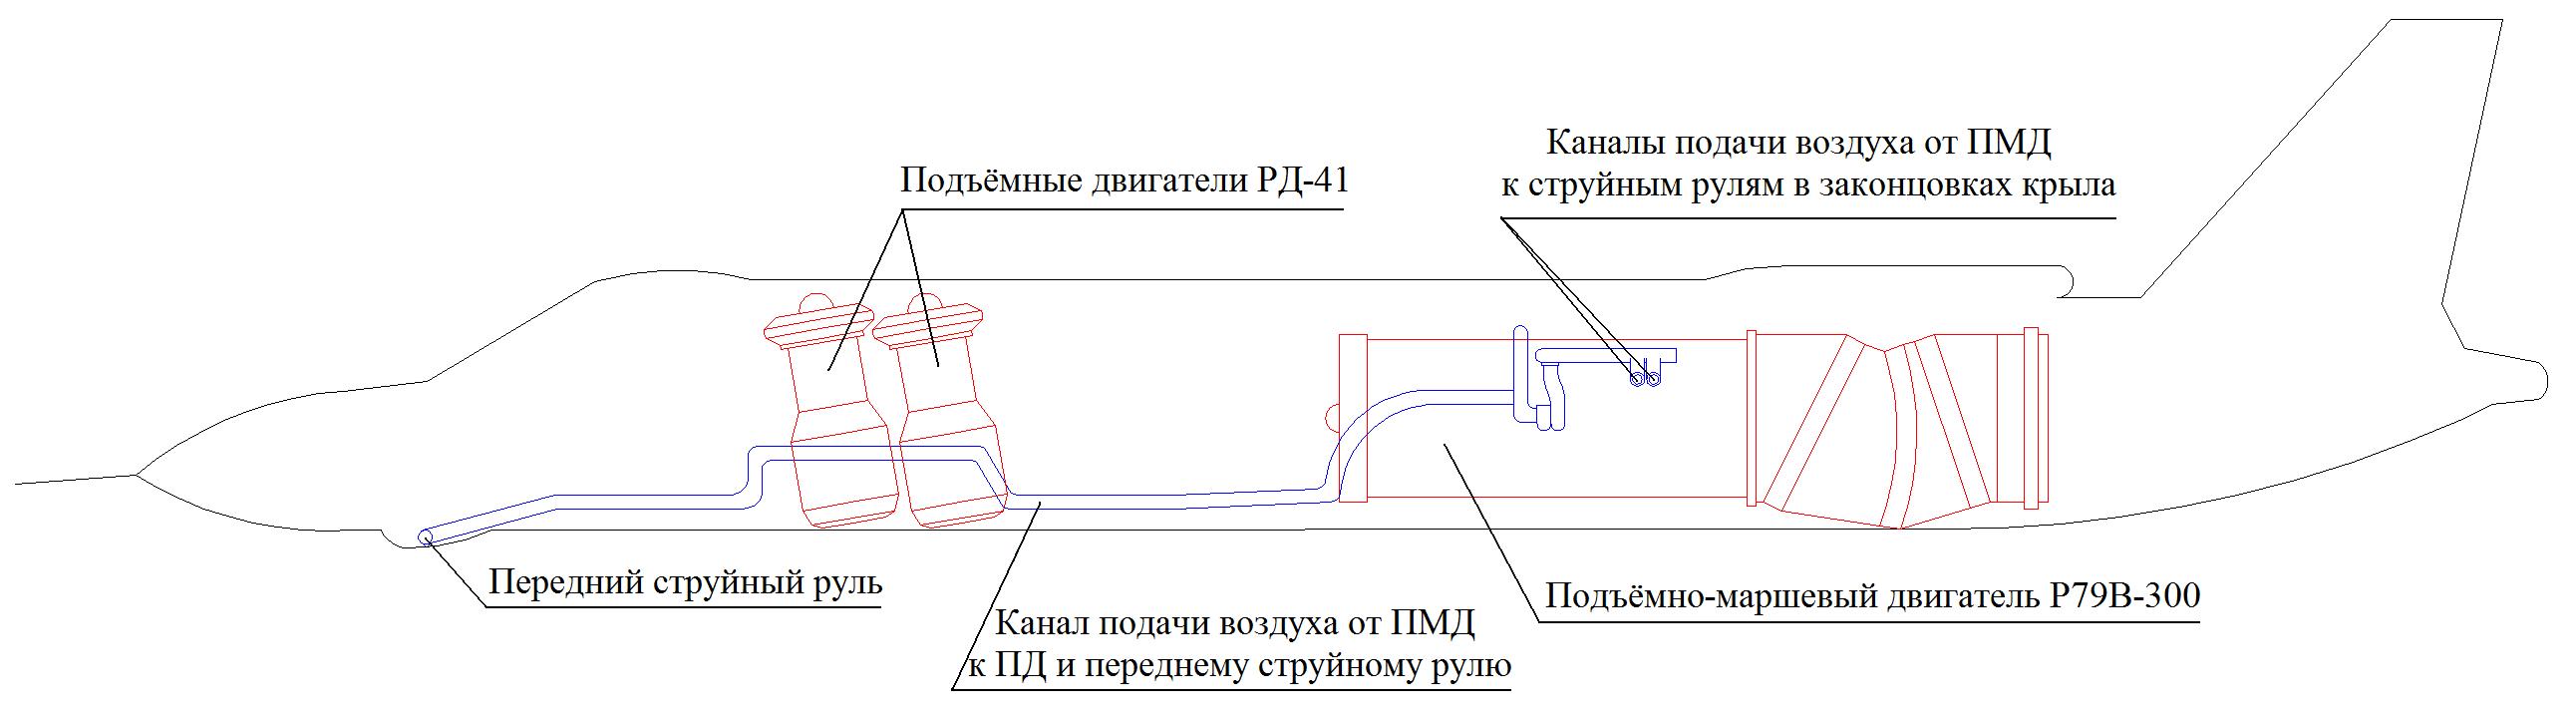 Scheme_of_Yak-141_powerplant.png